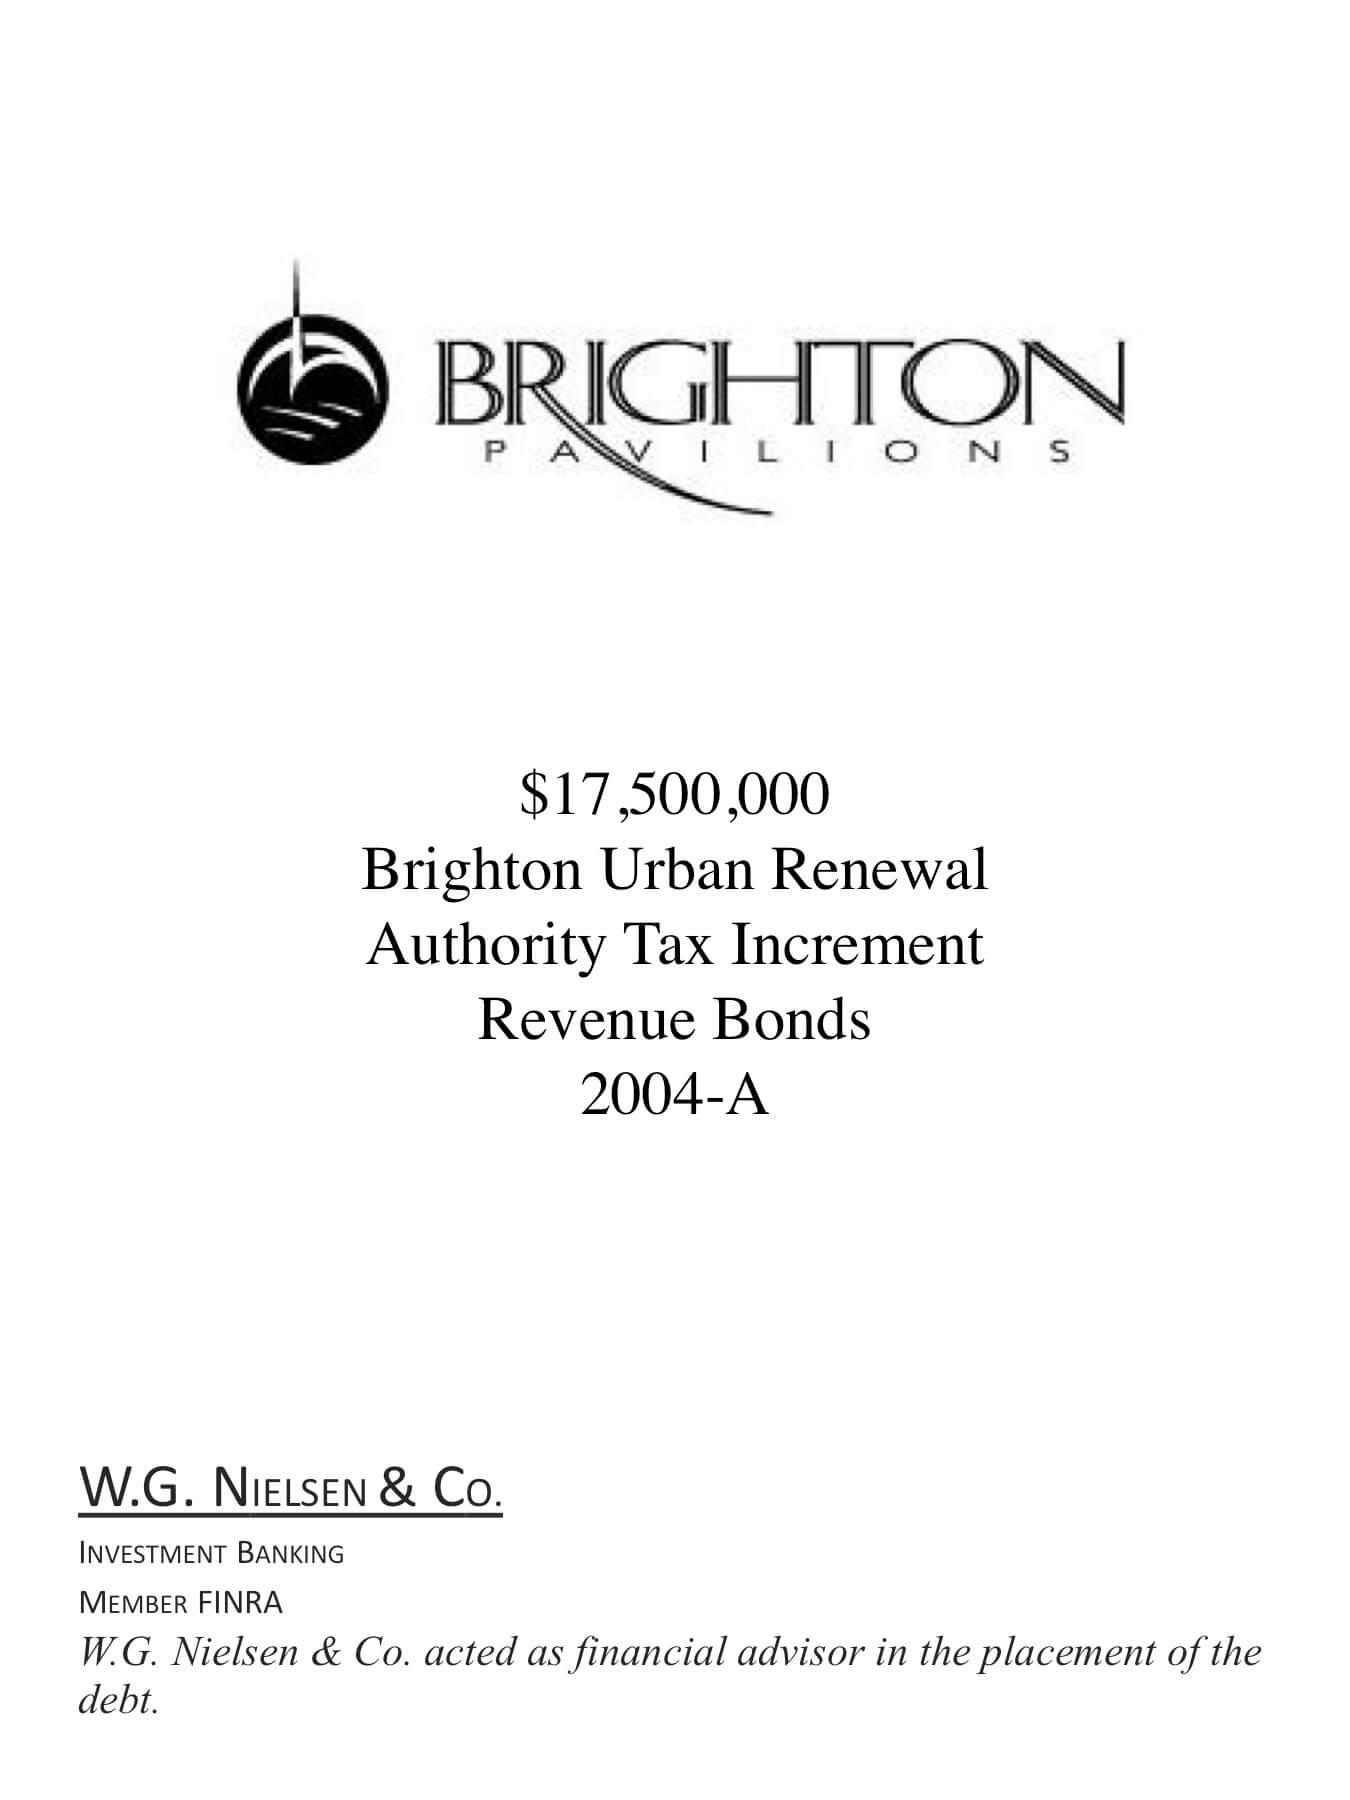 brighton pavilion investment banking transaction